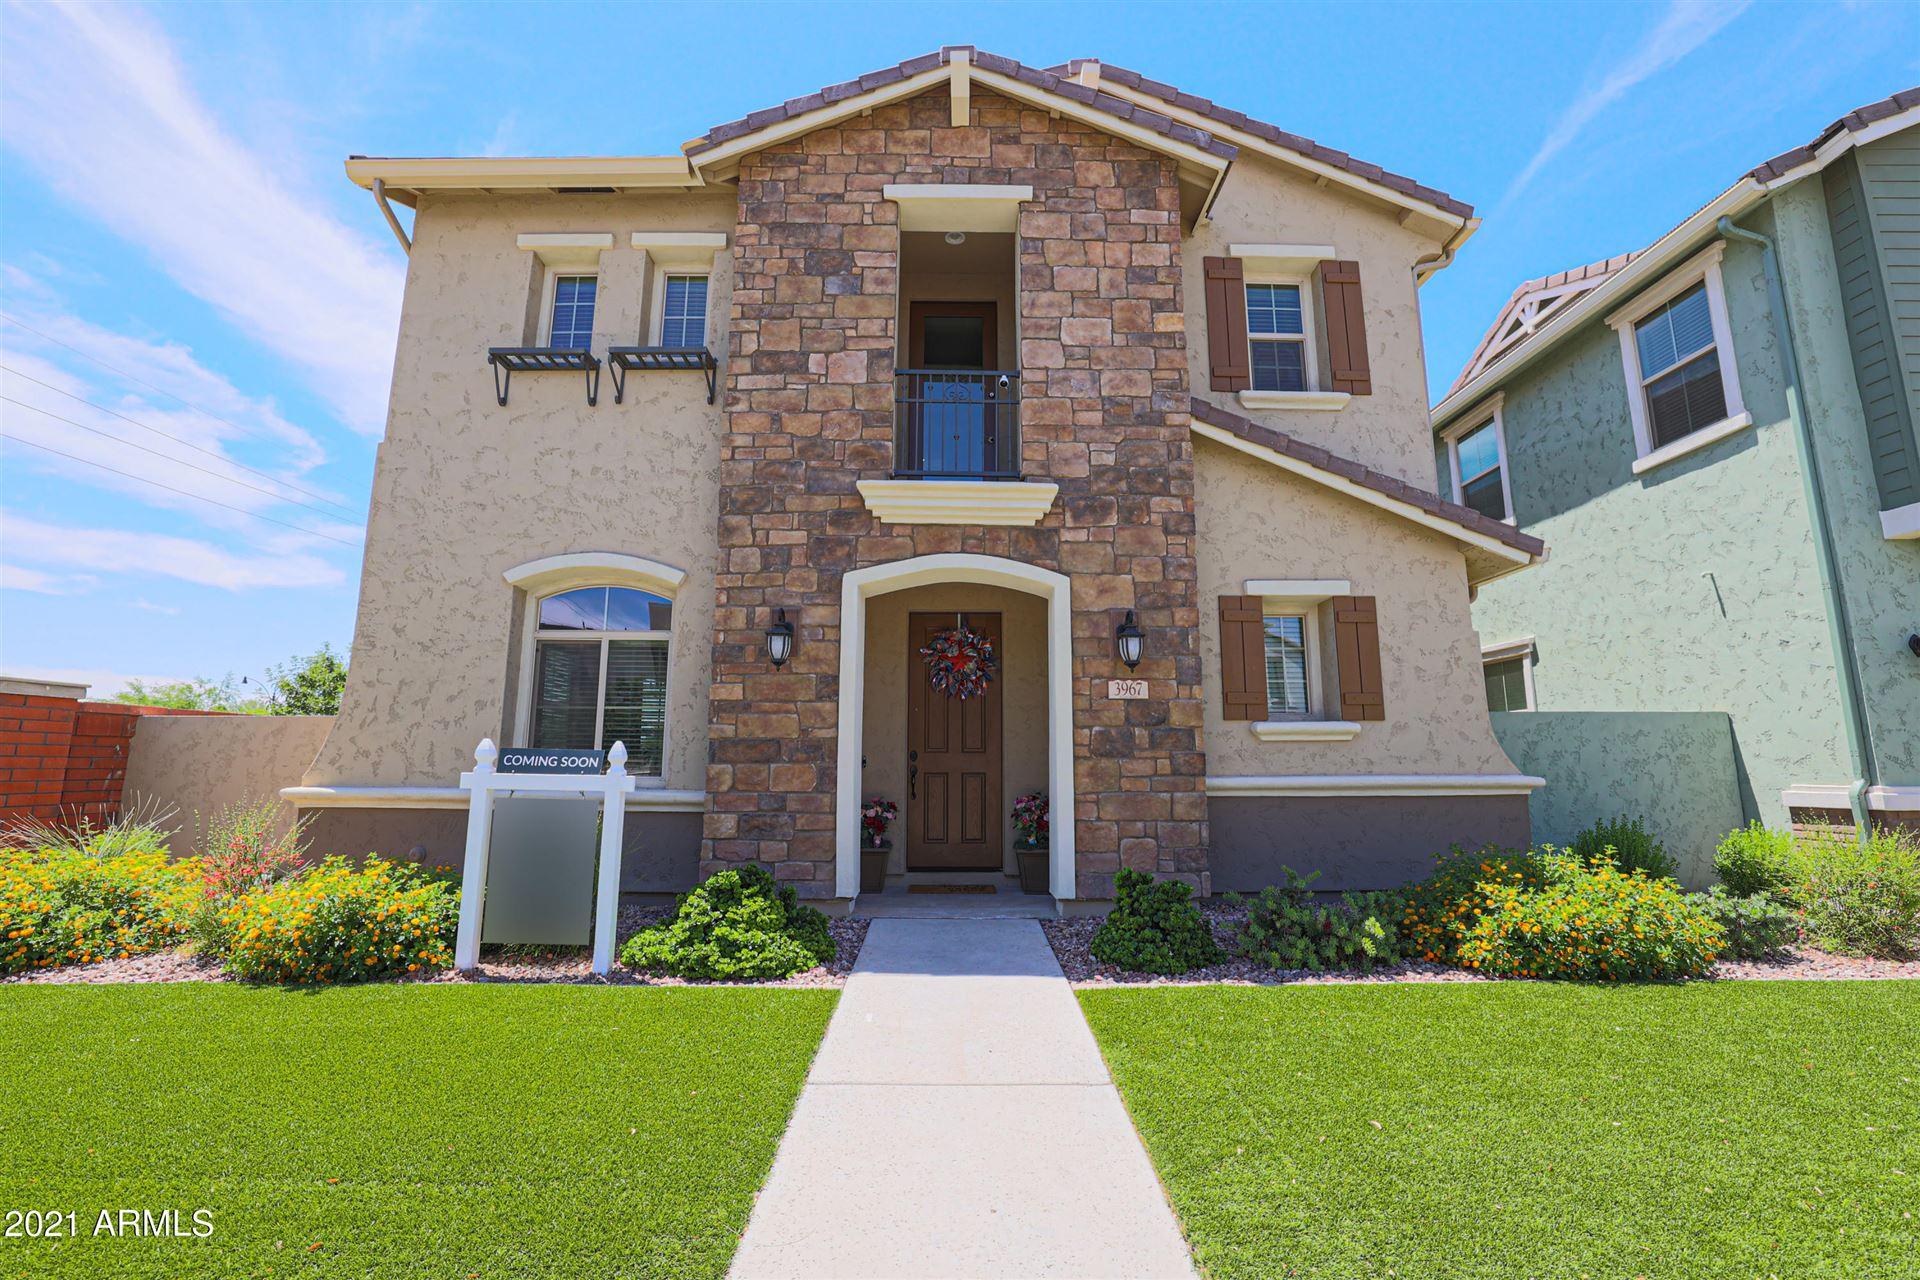 Photo of 3967 E GALVESTON Street, Gilbert, AZ 85295 (MLS # 6249895)